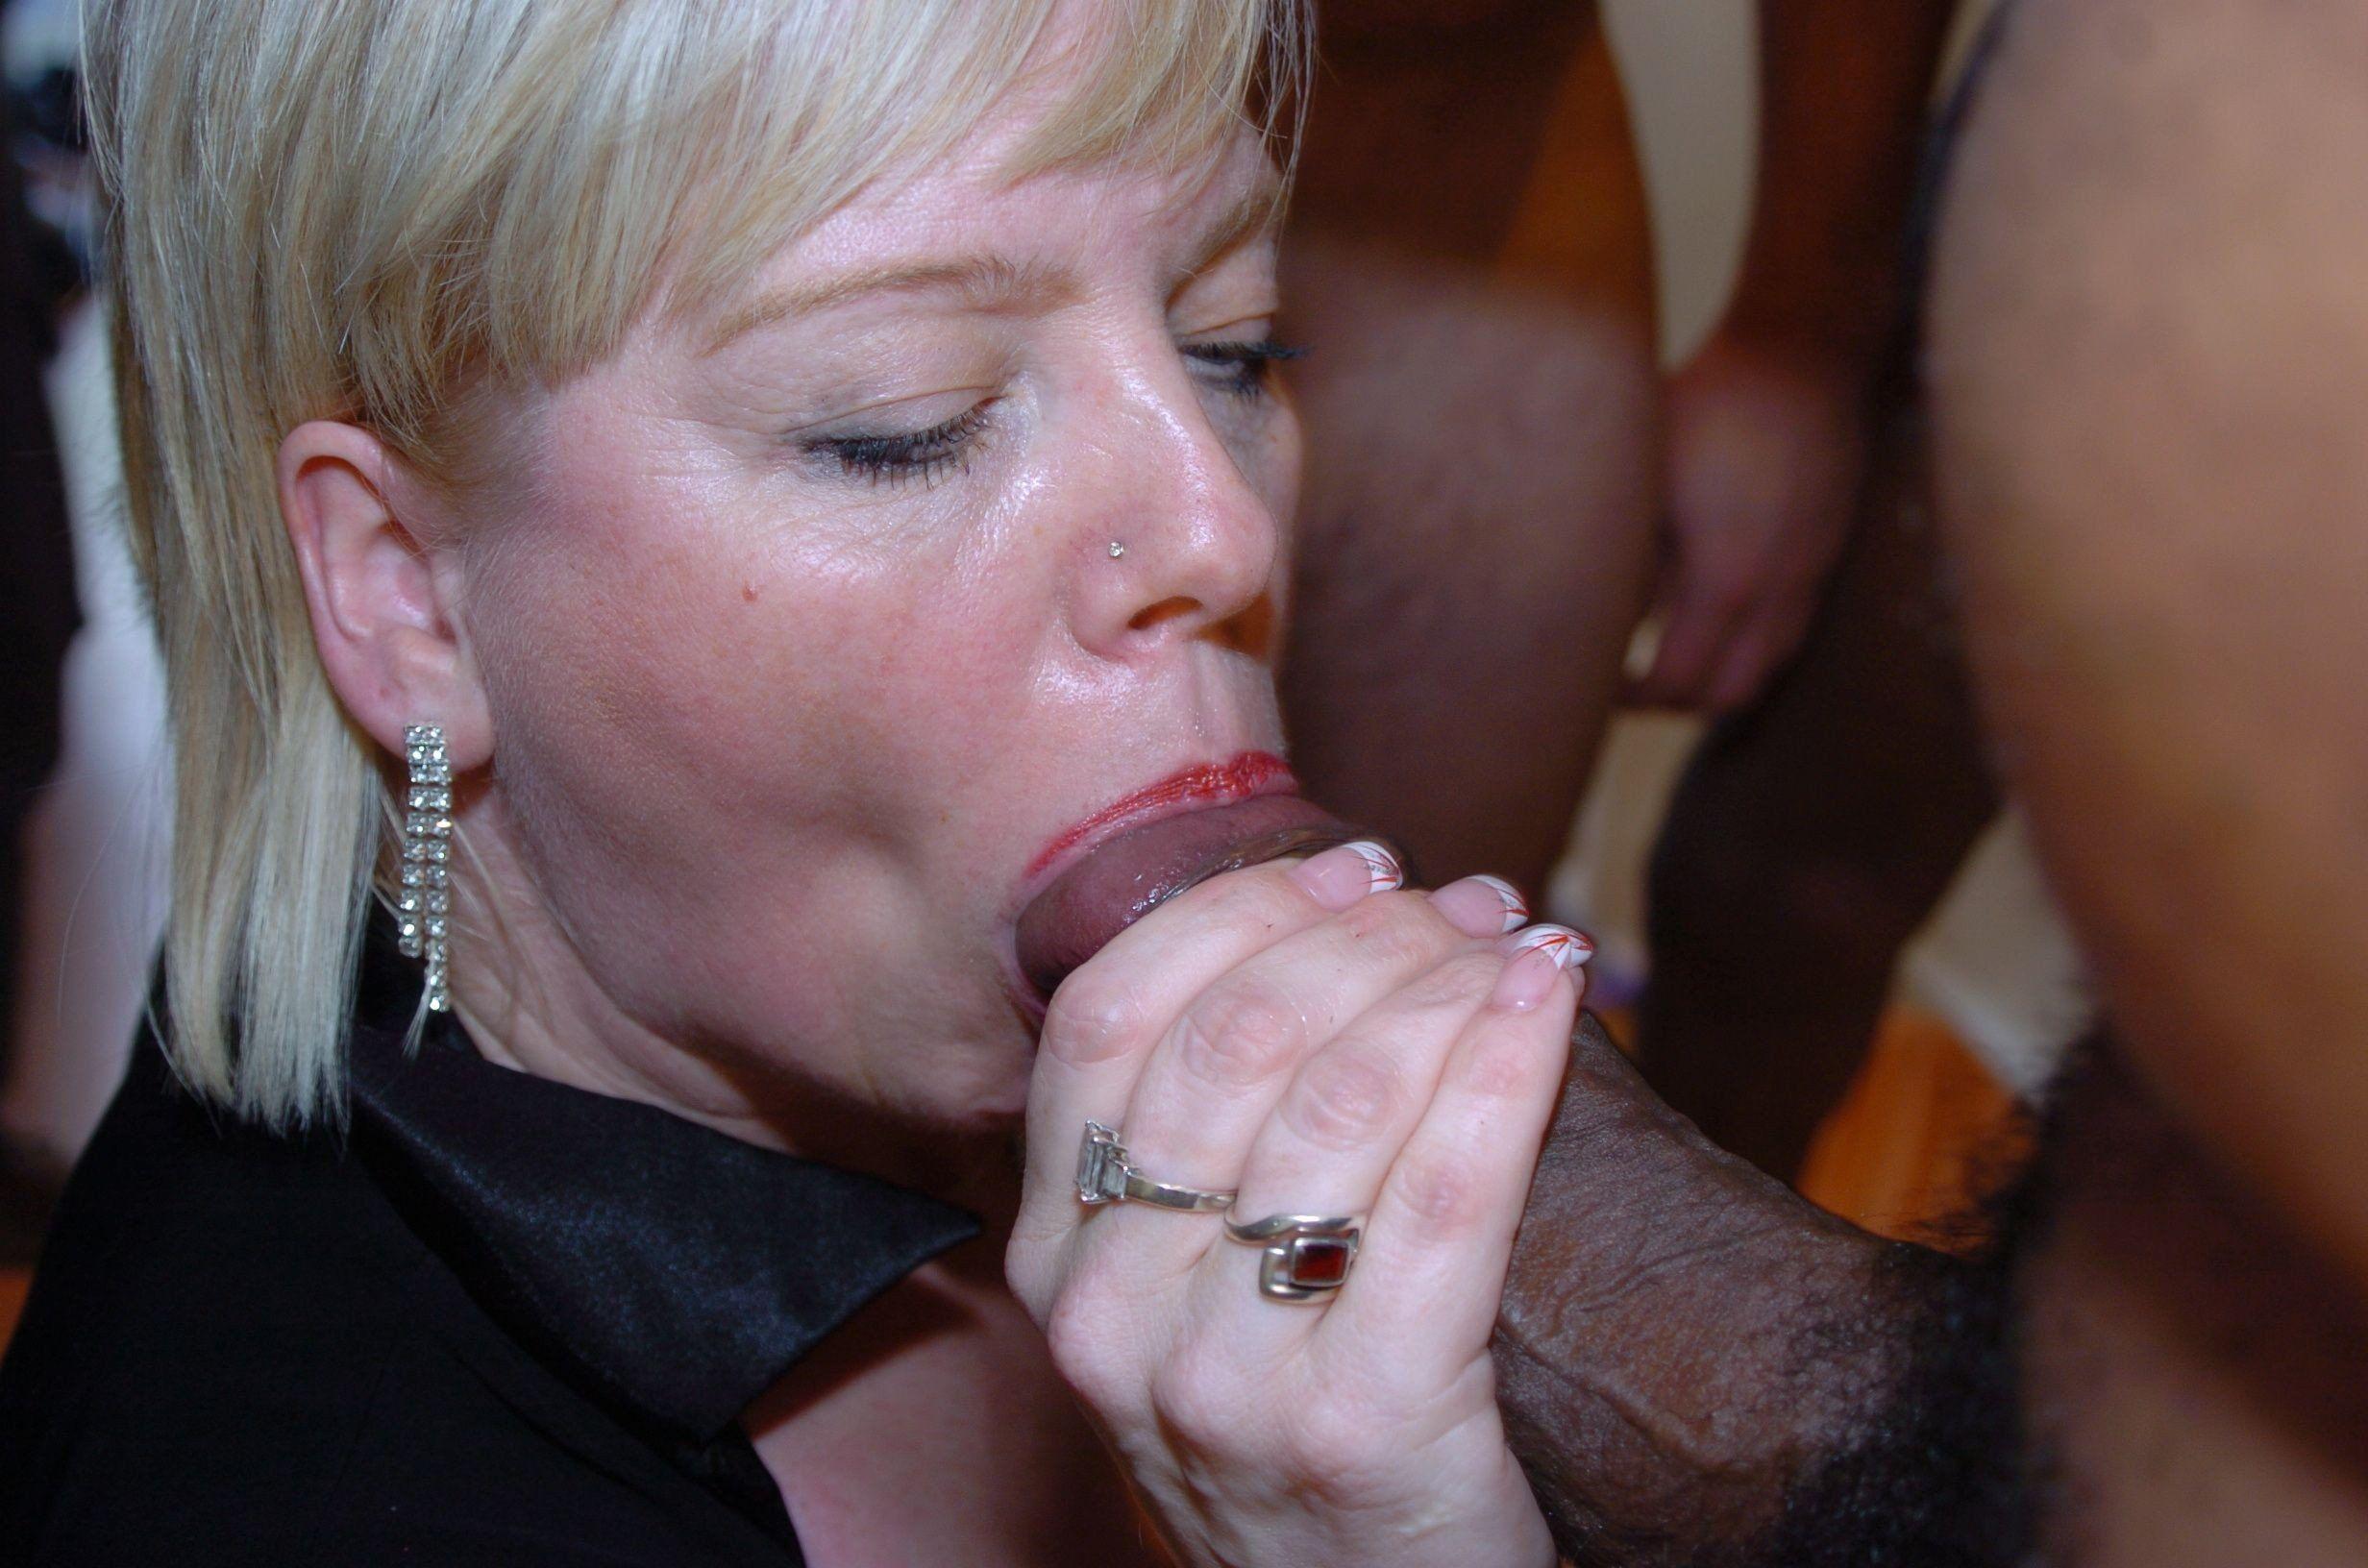 Donna british slut pictures recommend